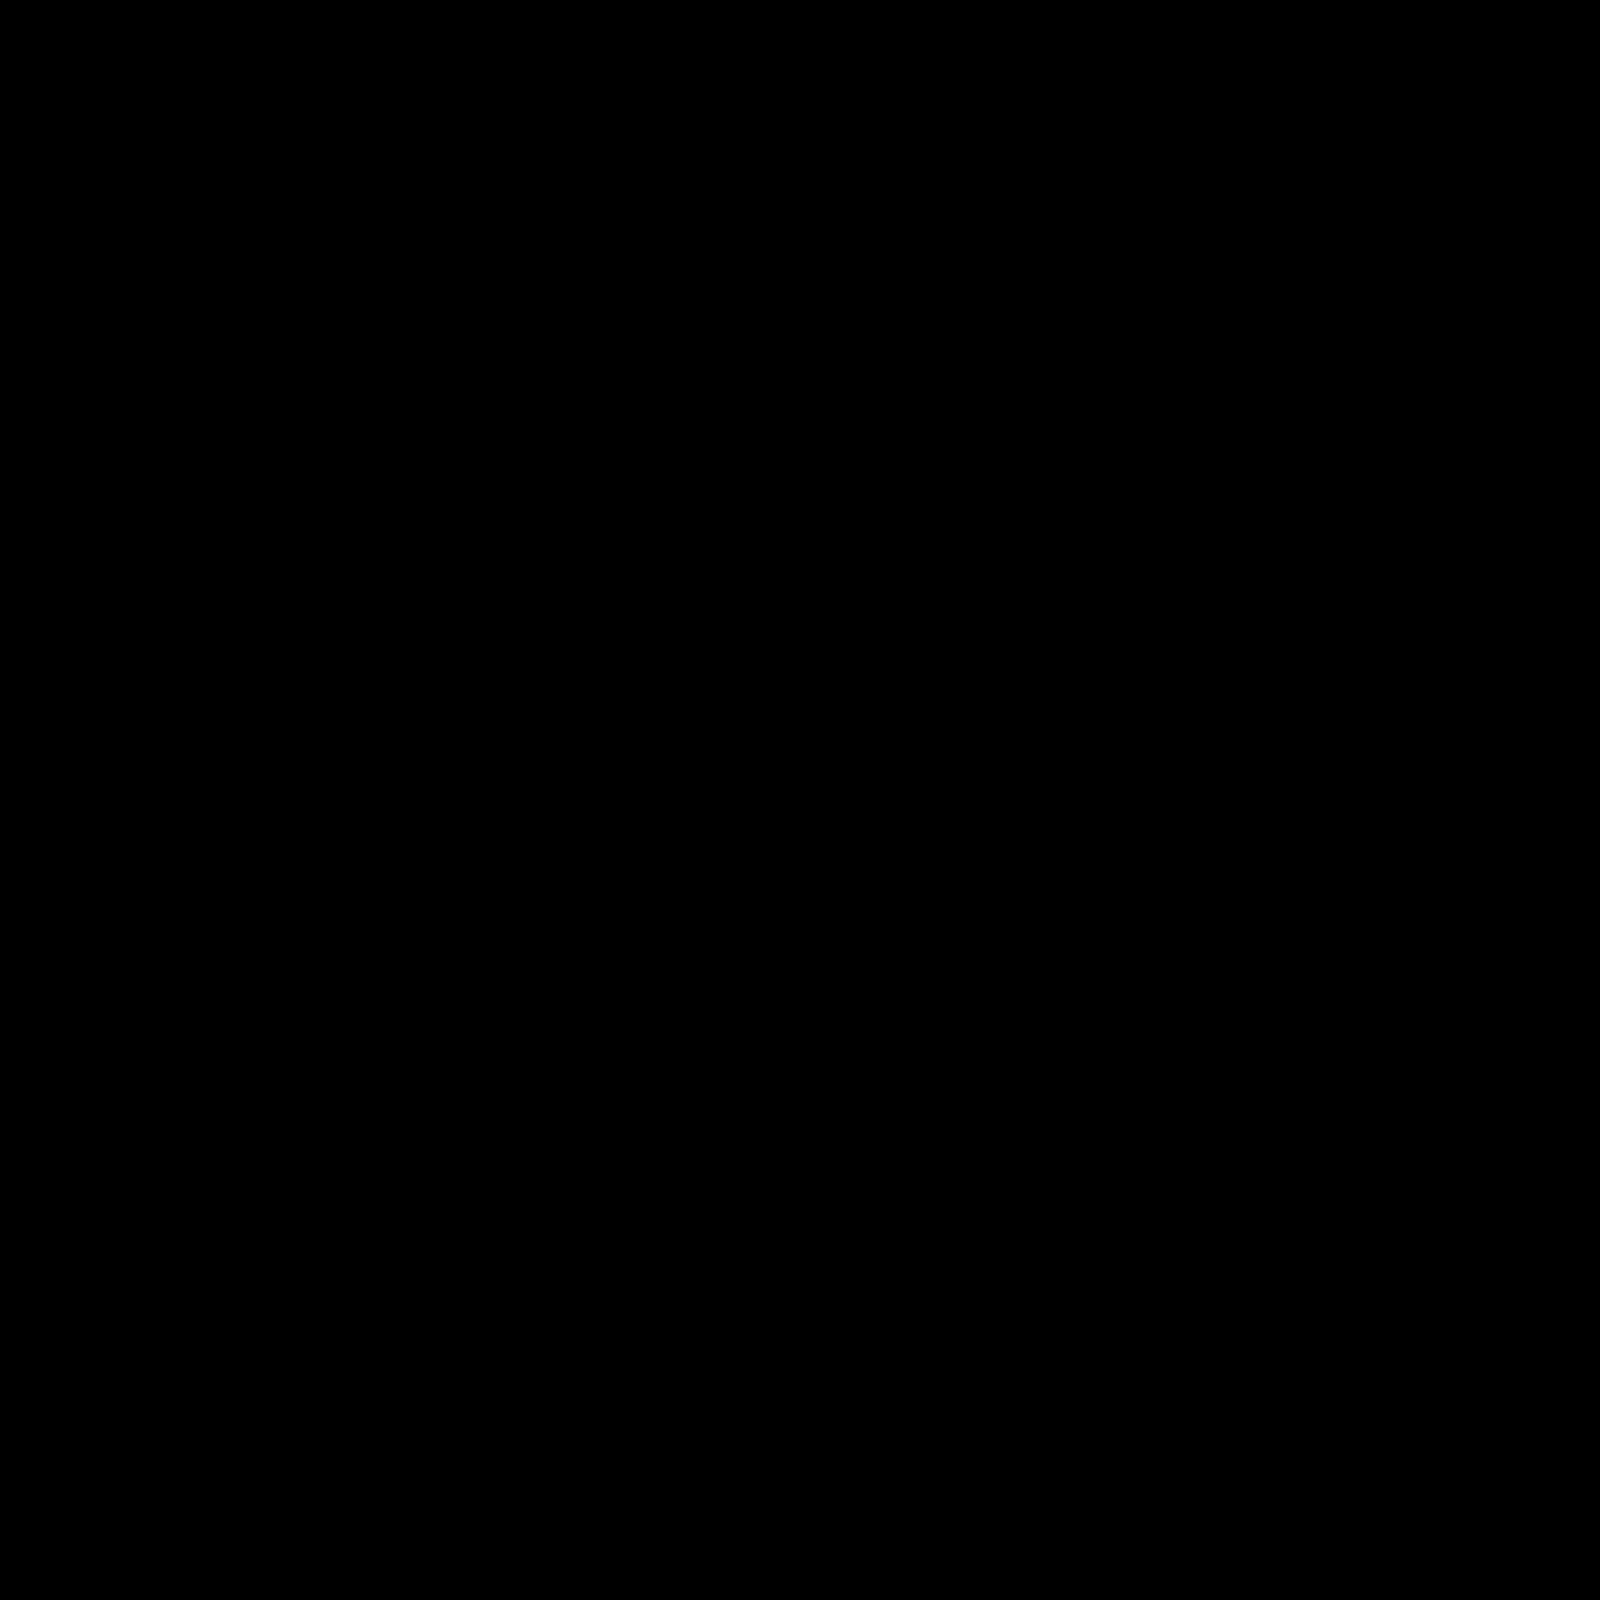 Timezone utc icon free. Website clipart computer time